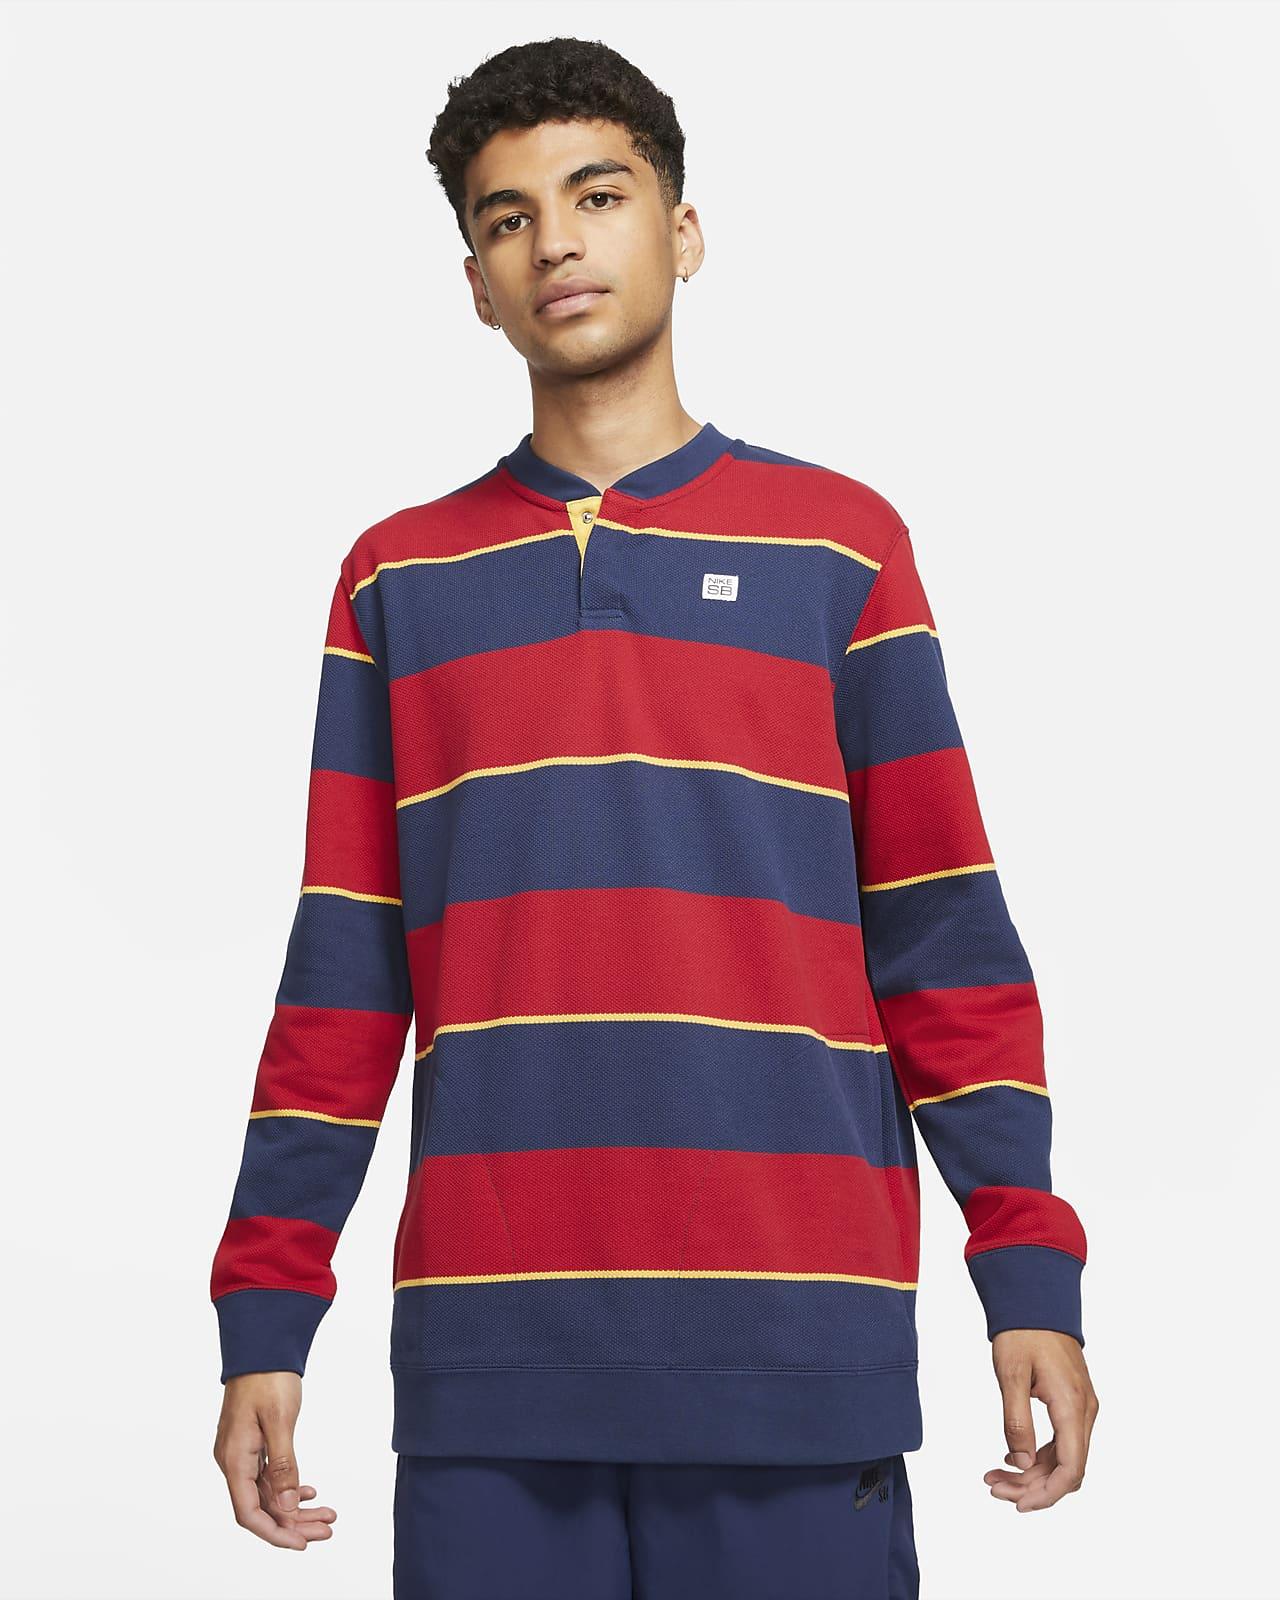 Bluza do skateboardingu Nike SB